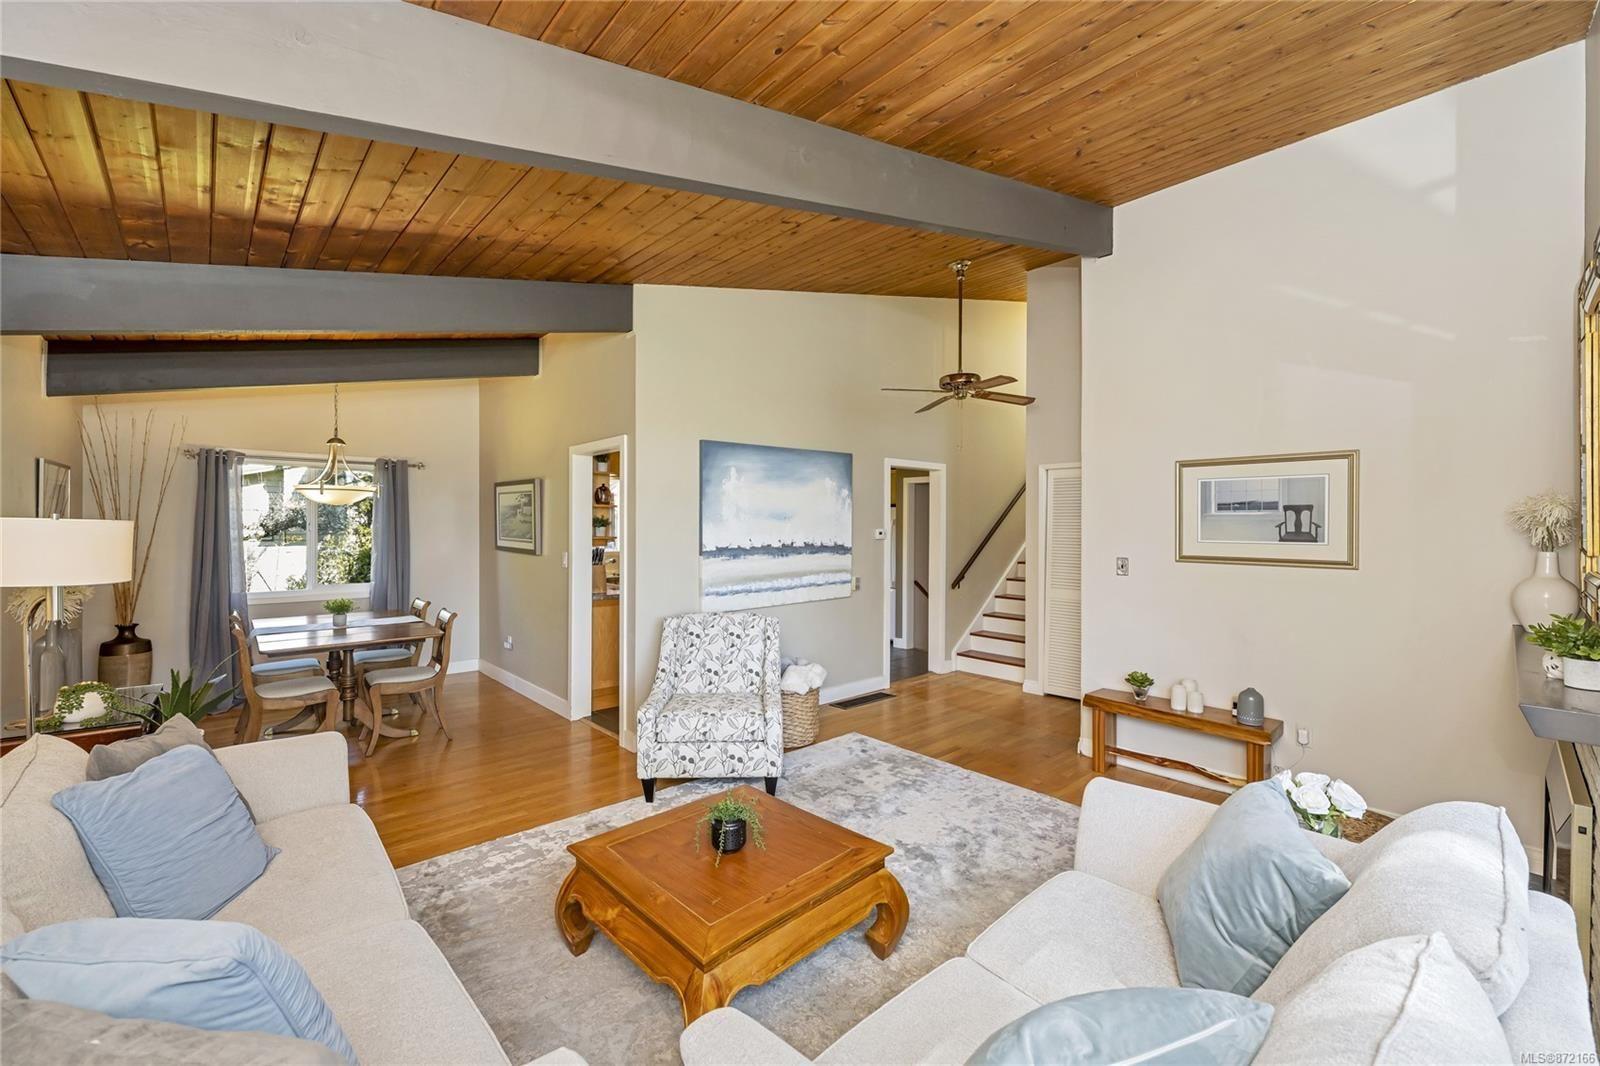 Photo 4: Photos: 1690 Blair Ave in : SE Lambrick Park House for sale (Saanich East)  : MLS®# 872166